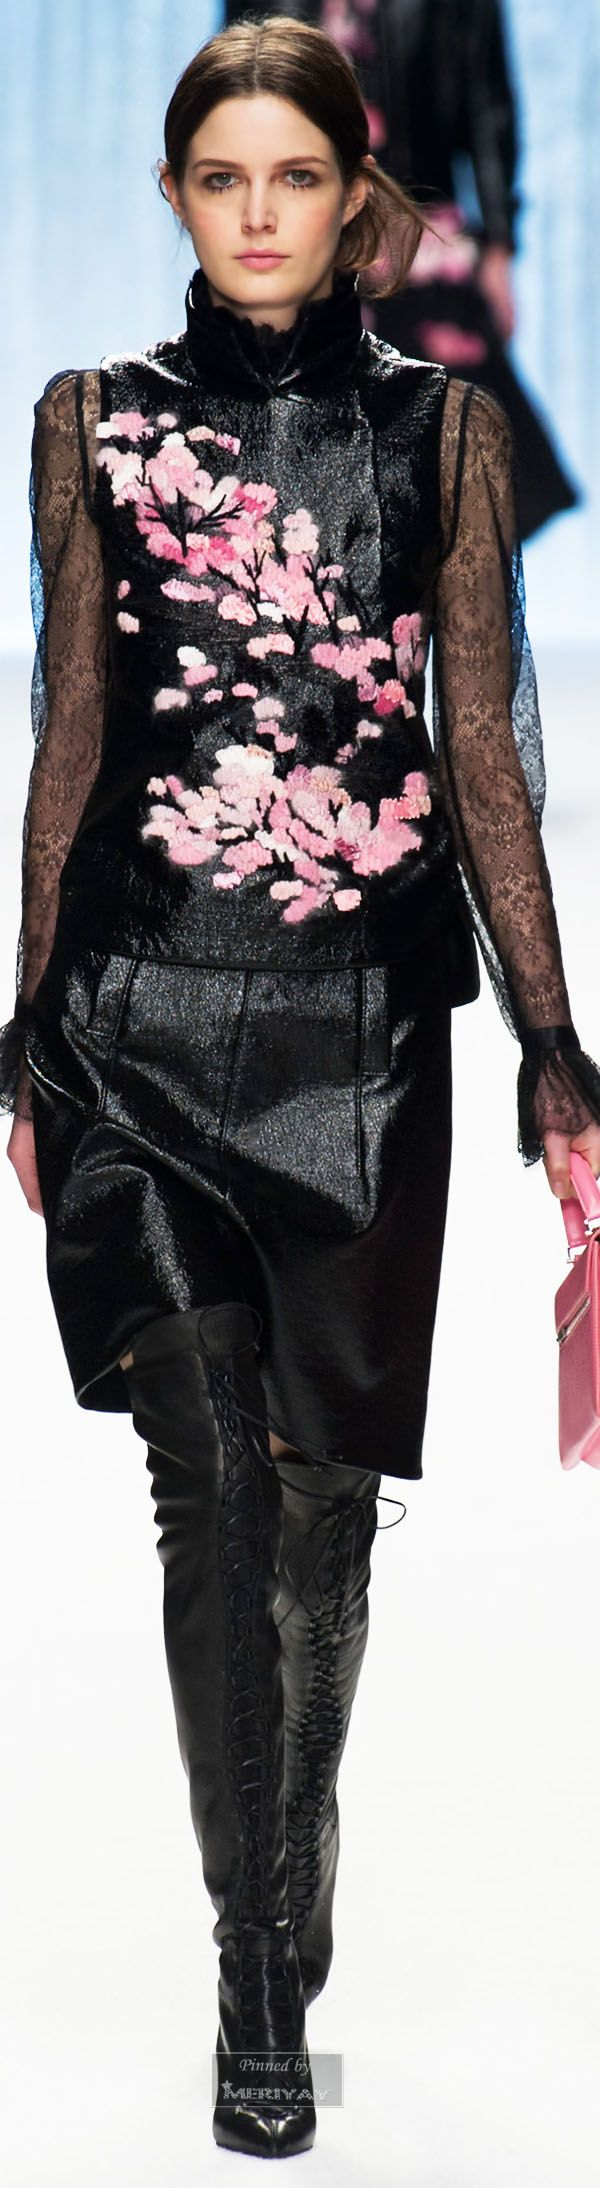 Farb- und Stilberatung mit www.farben-reich.com - Shiatzy Chen.Fall 2015.